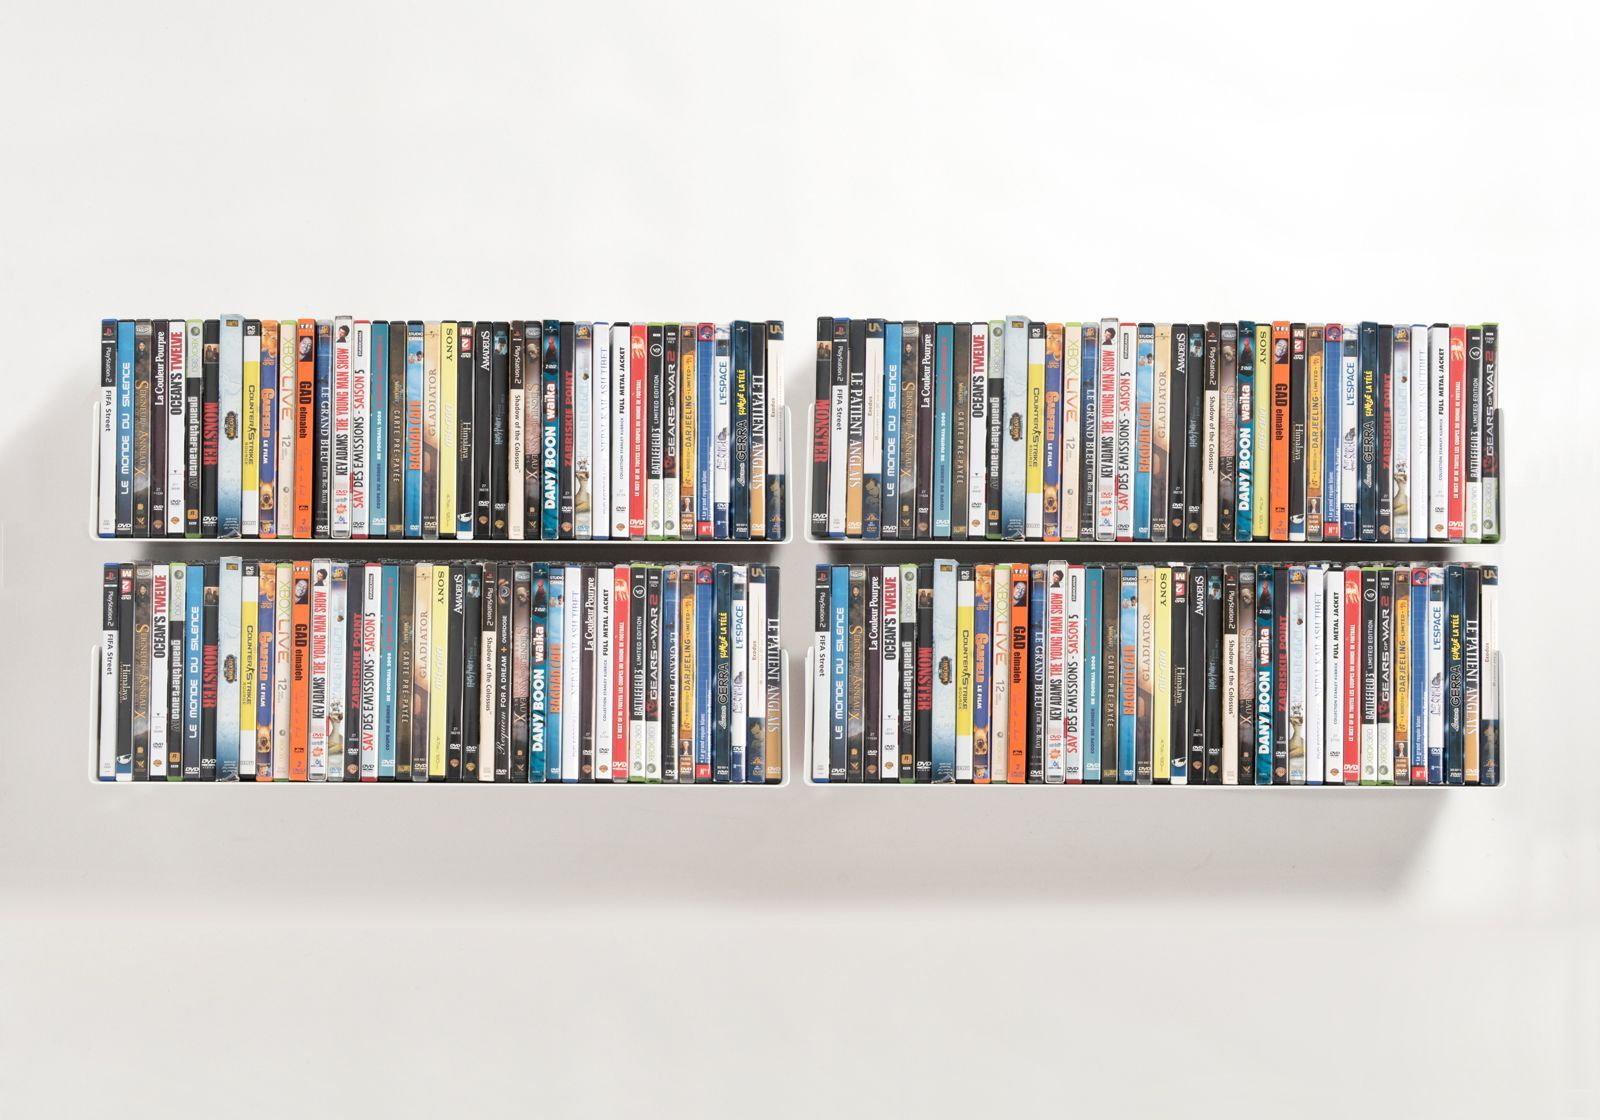 Set mit 4 UDVD - DVD-Regalen